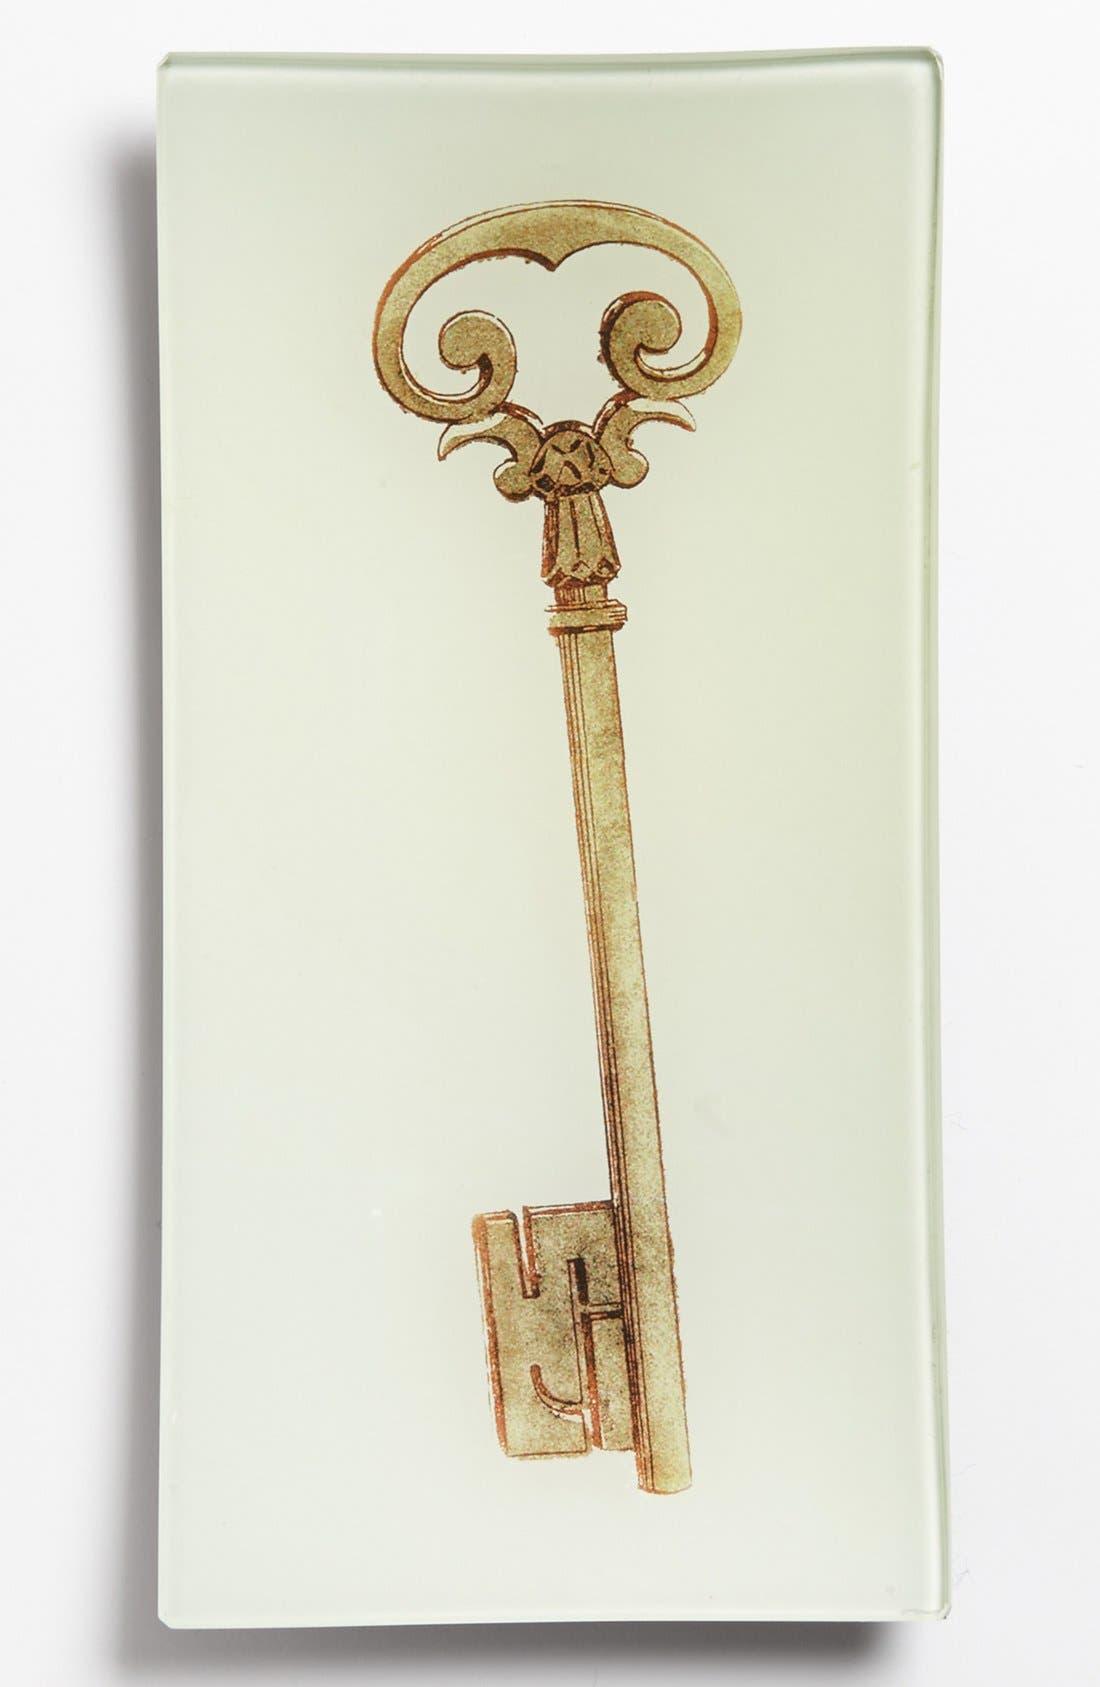 Alternate Image 1 Selected - Ben's Garden 'Antique Estate Key' Trinket Tray